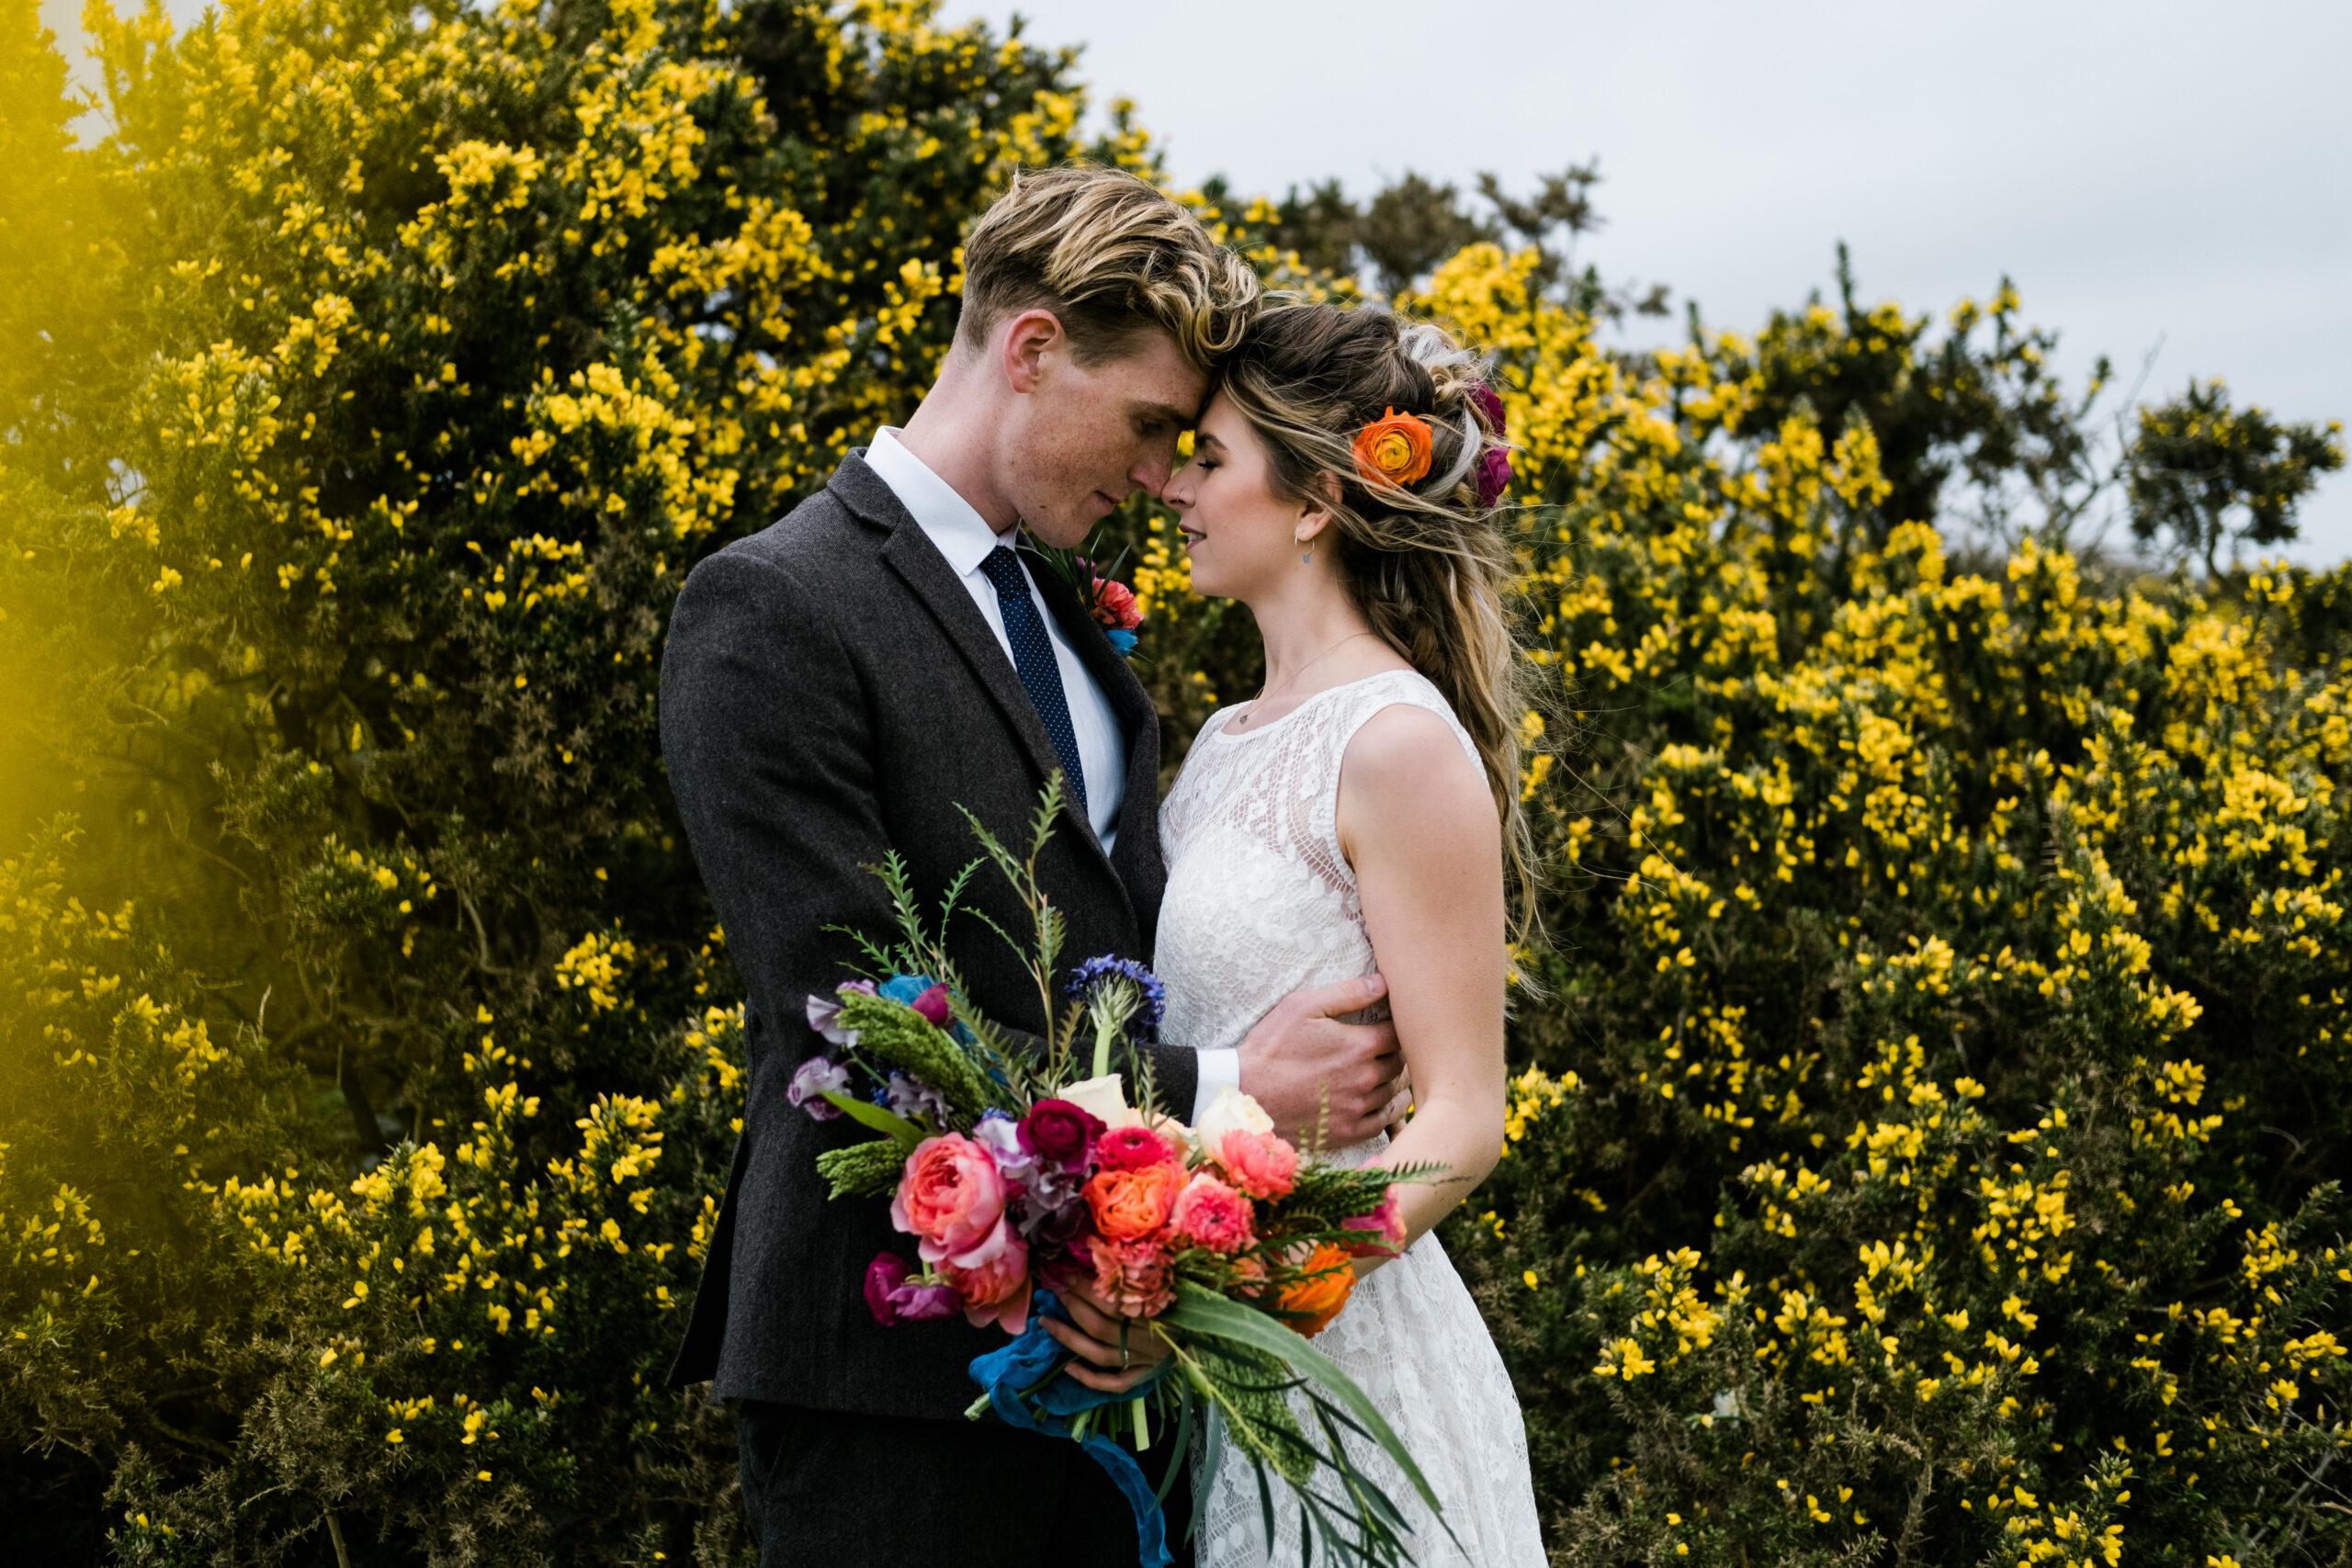 Wedding couple at outdoor boho wedding venue with yellow Cornish gorse